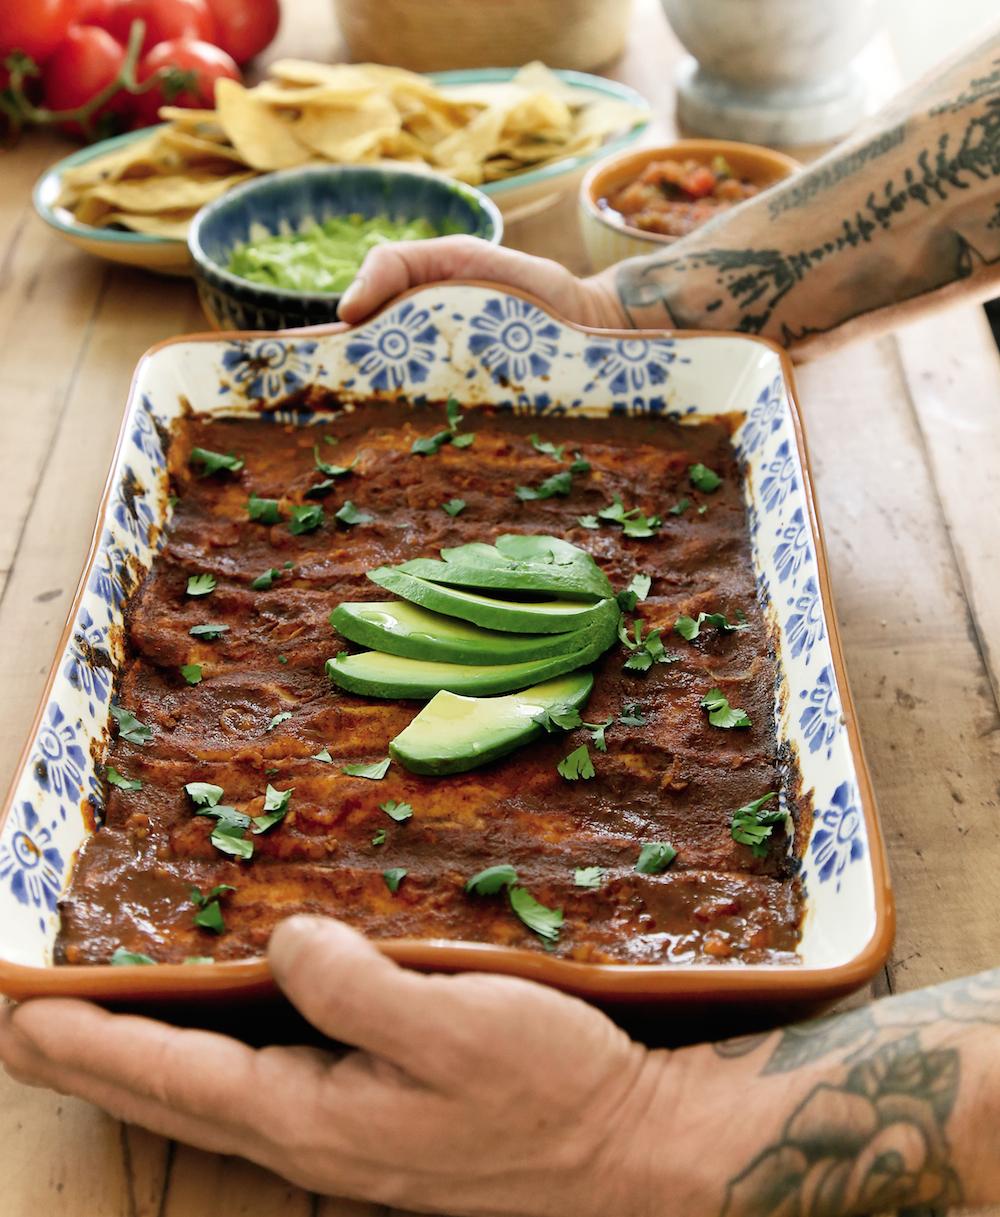 073330_Enchiladas-Edit.jpg